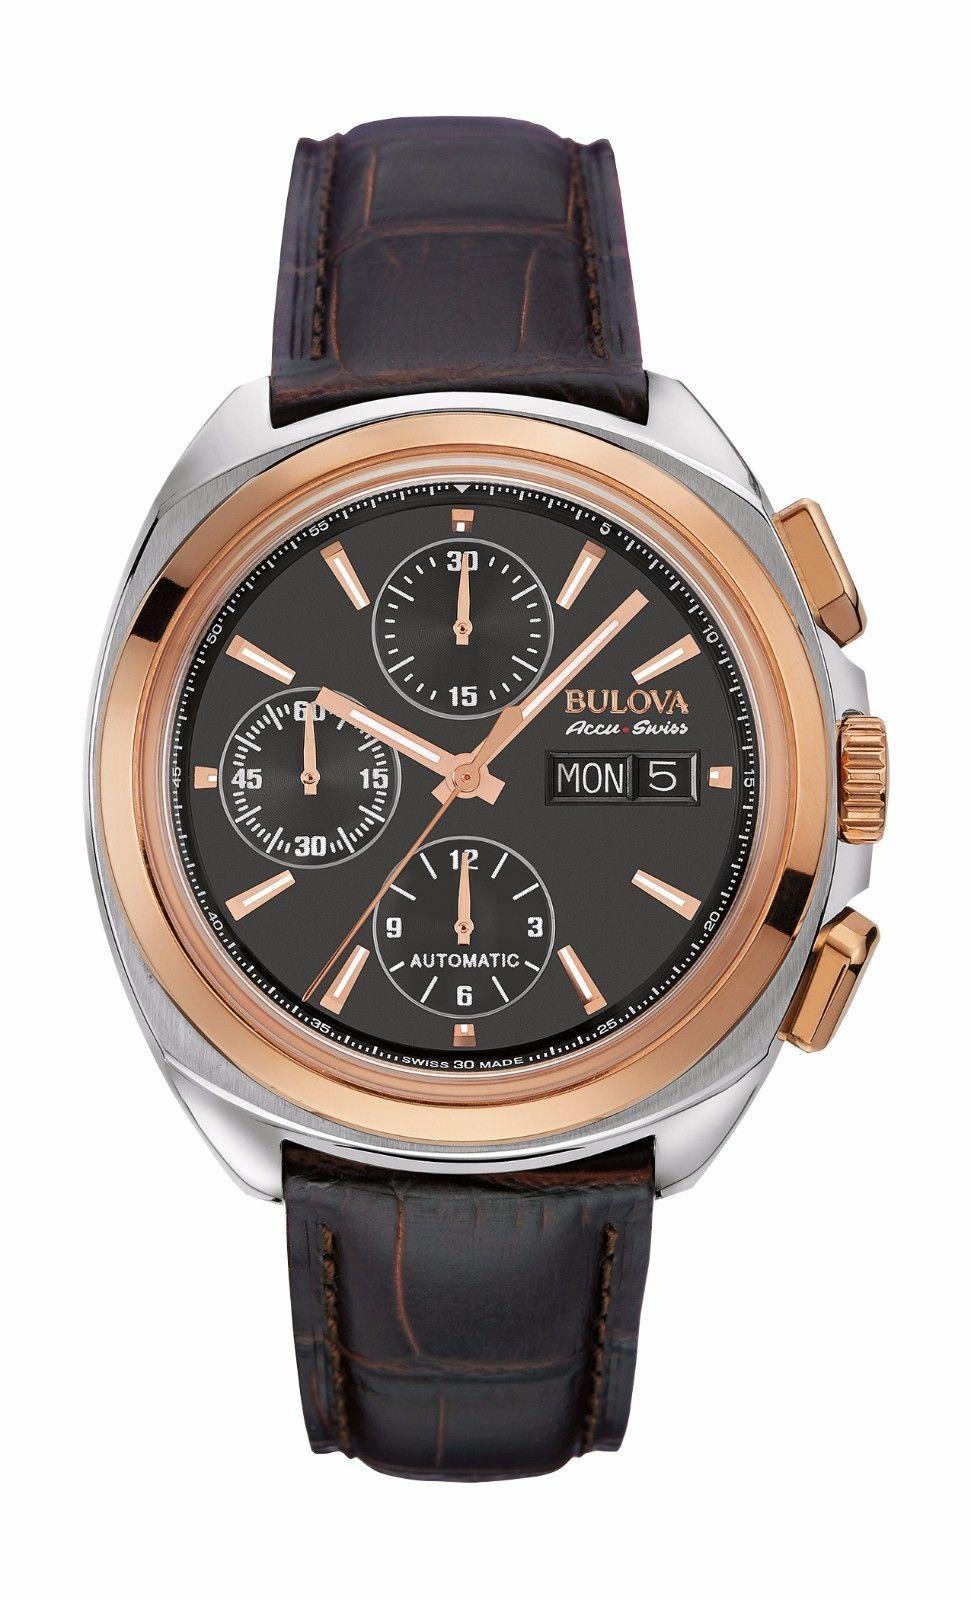 Bulova Accutron Men's 65B167 Accu Swiss Chronograph Black Dial Watch $265